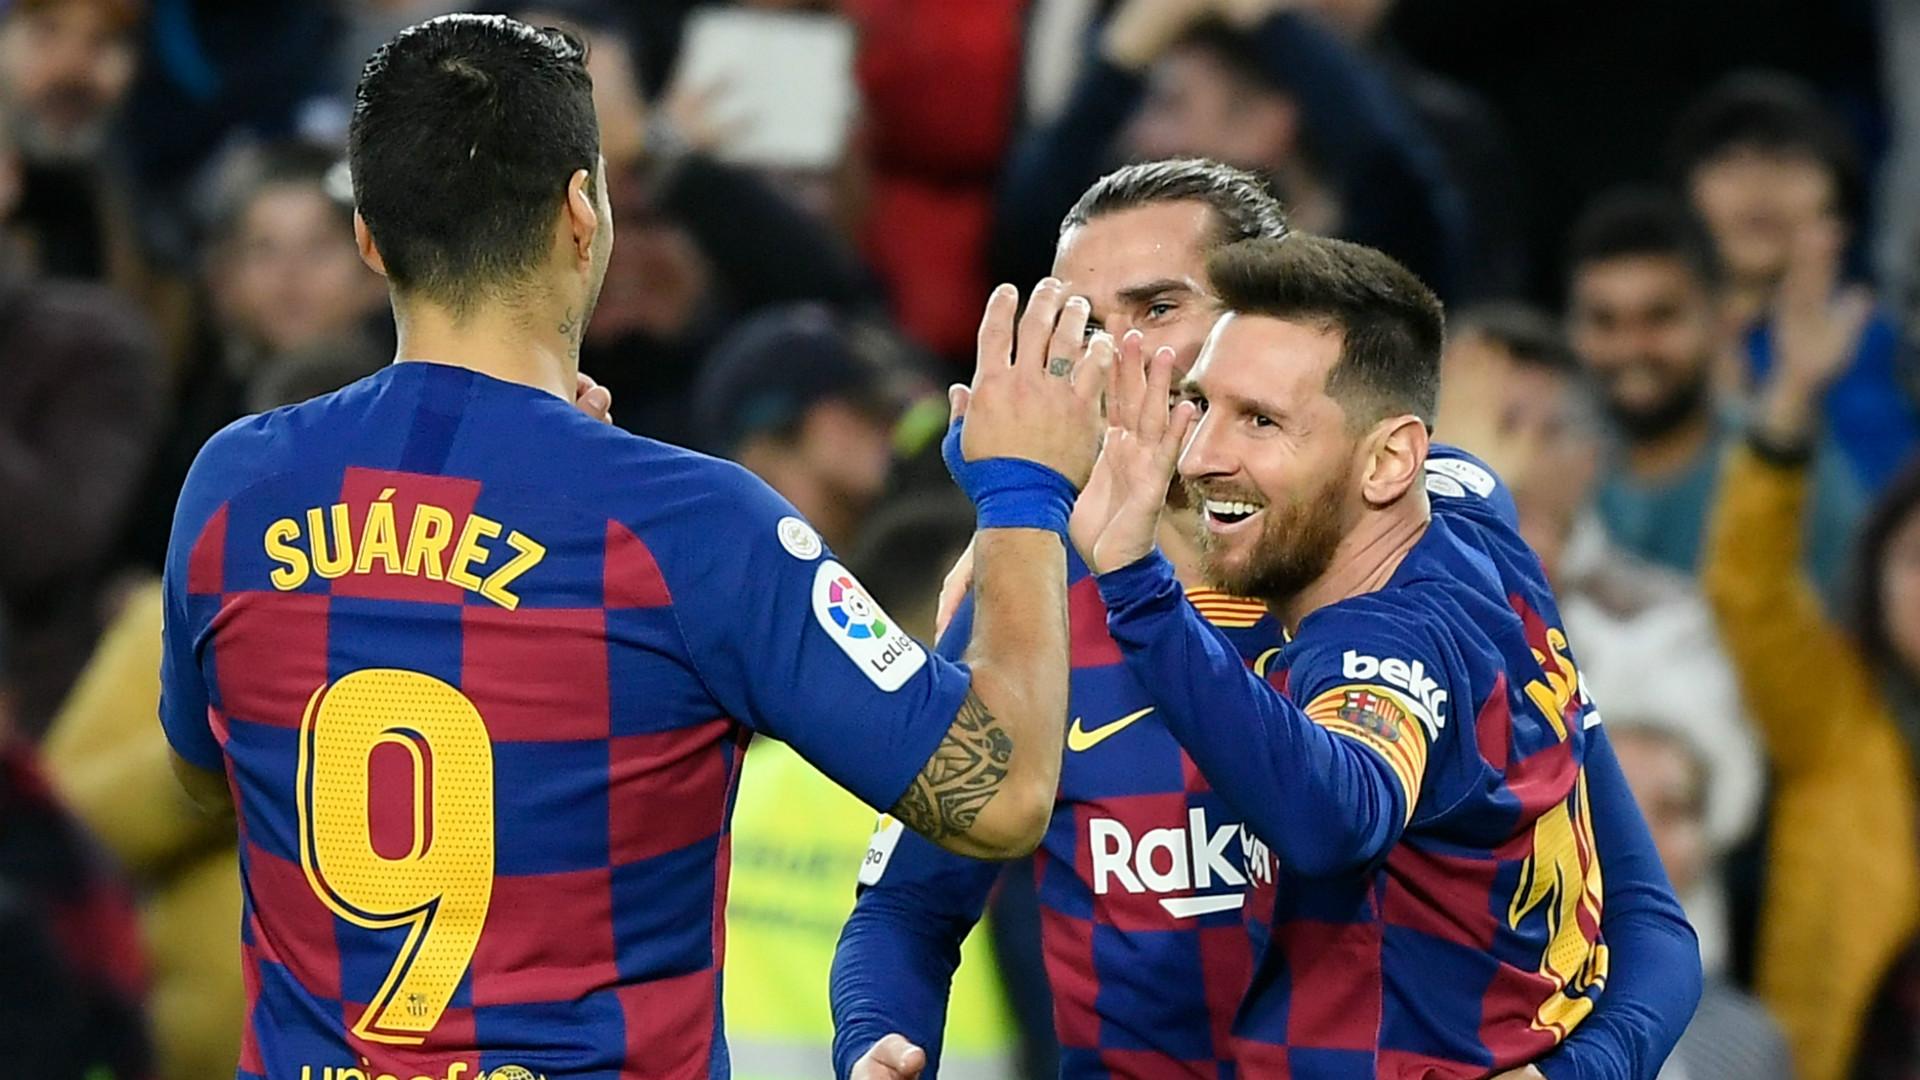 Ernesto Valverde heaps praise on Lionel Messi after Barcelona's win against Alaves